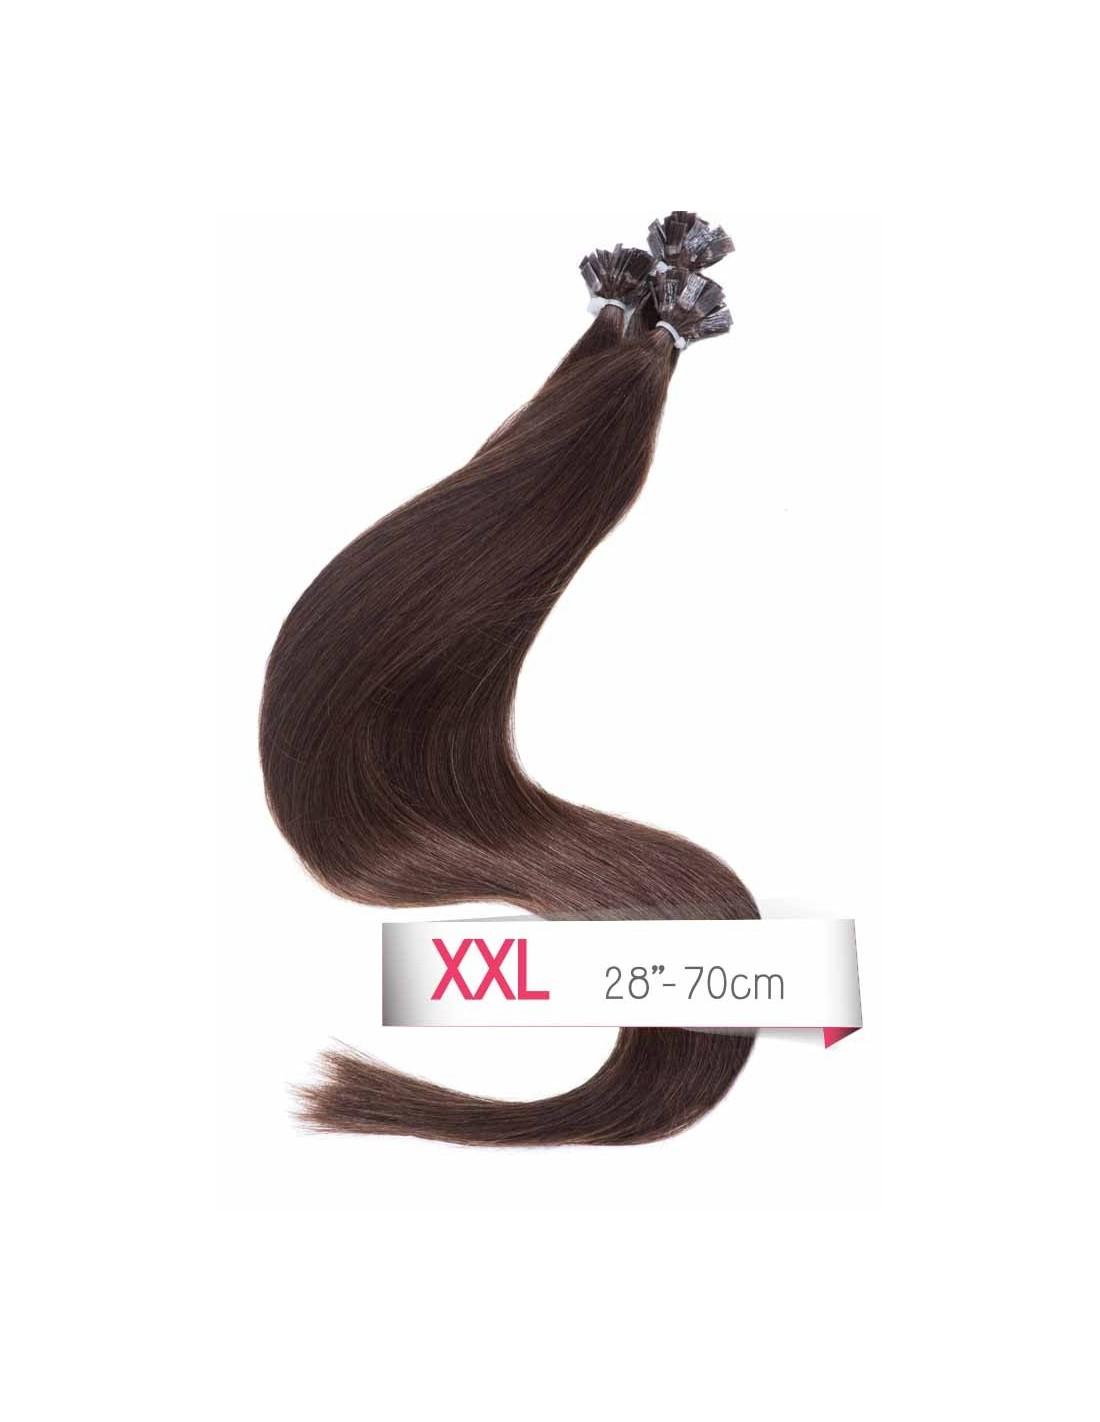 extension k ratine 1gr xxxl m ches chaud extens hair. Black Bedroom Furniture Sets. Home Design Ideas